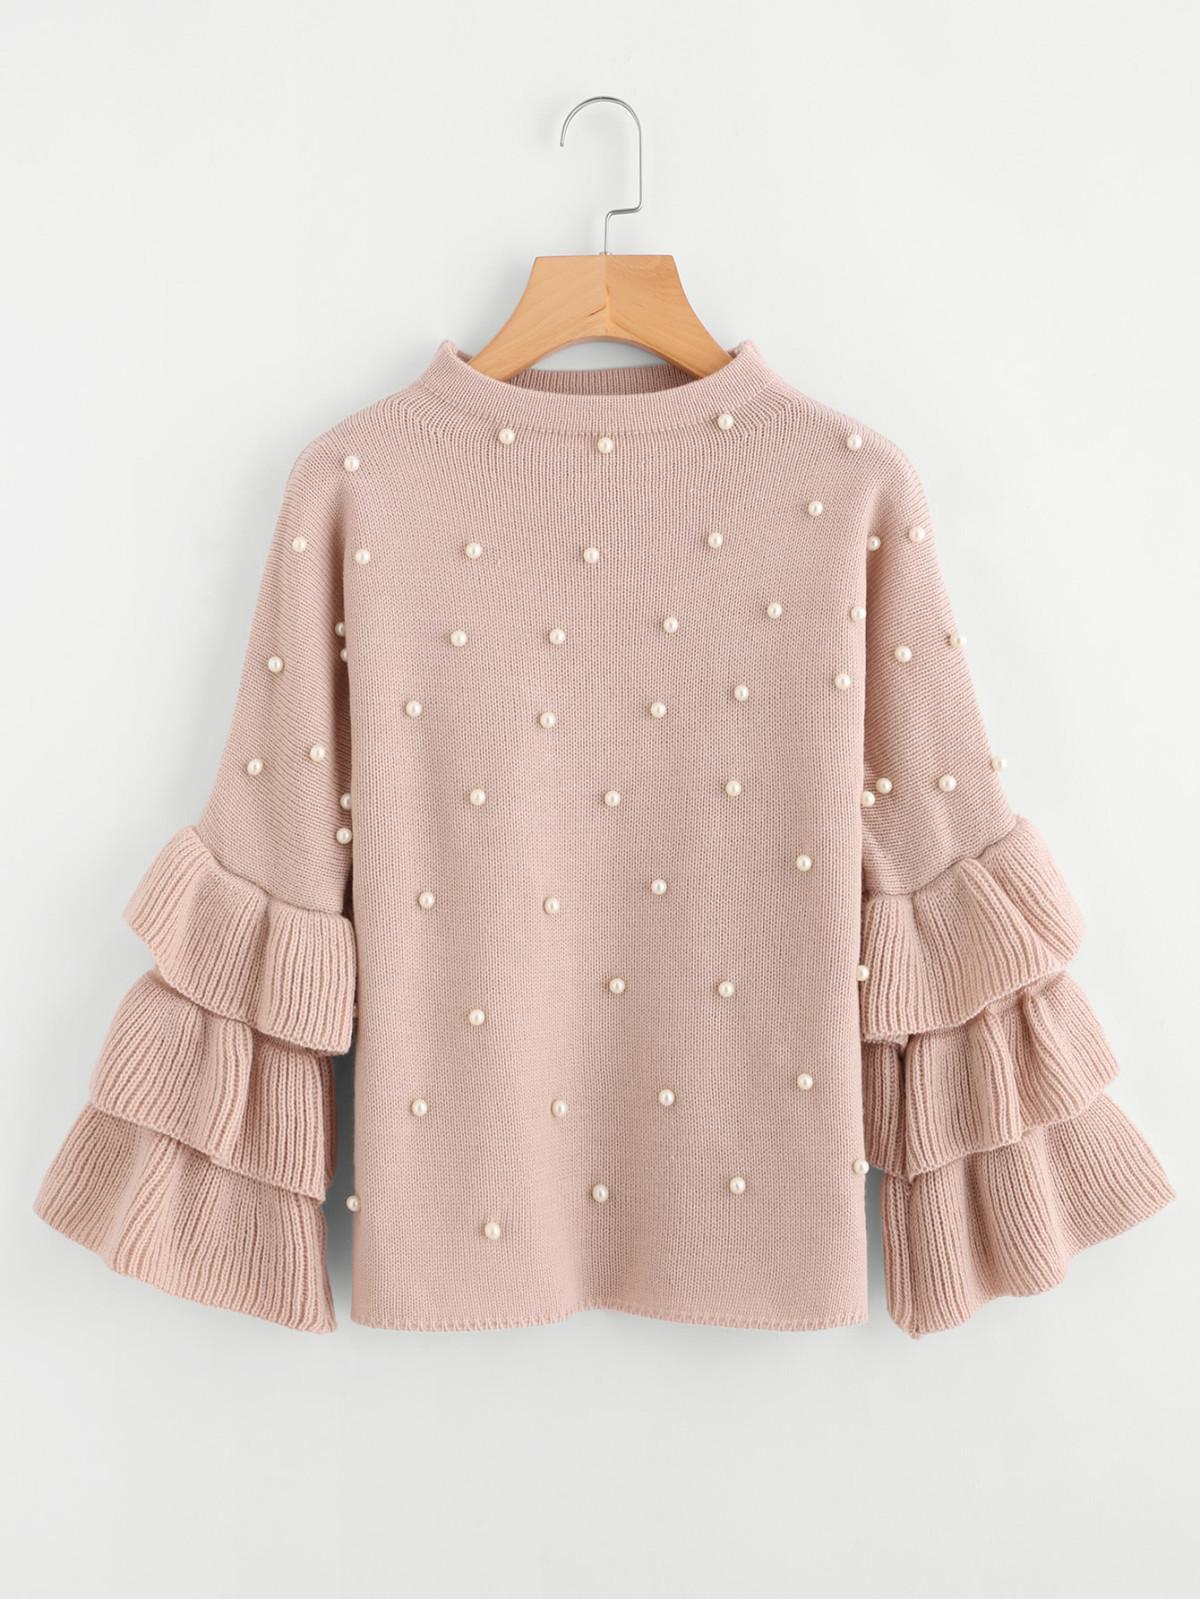 peal beaded sweater, cute sweaters, cute sweaters winter 2018, best sweaters to buy now, spring sweaters, pearl sweater, bell sleeve sweater, cute pink sweater, tie front sweater, romwe blogger, romwe fashion, romwe style